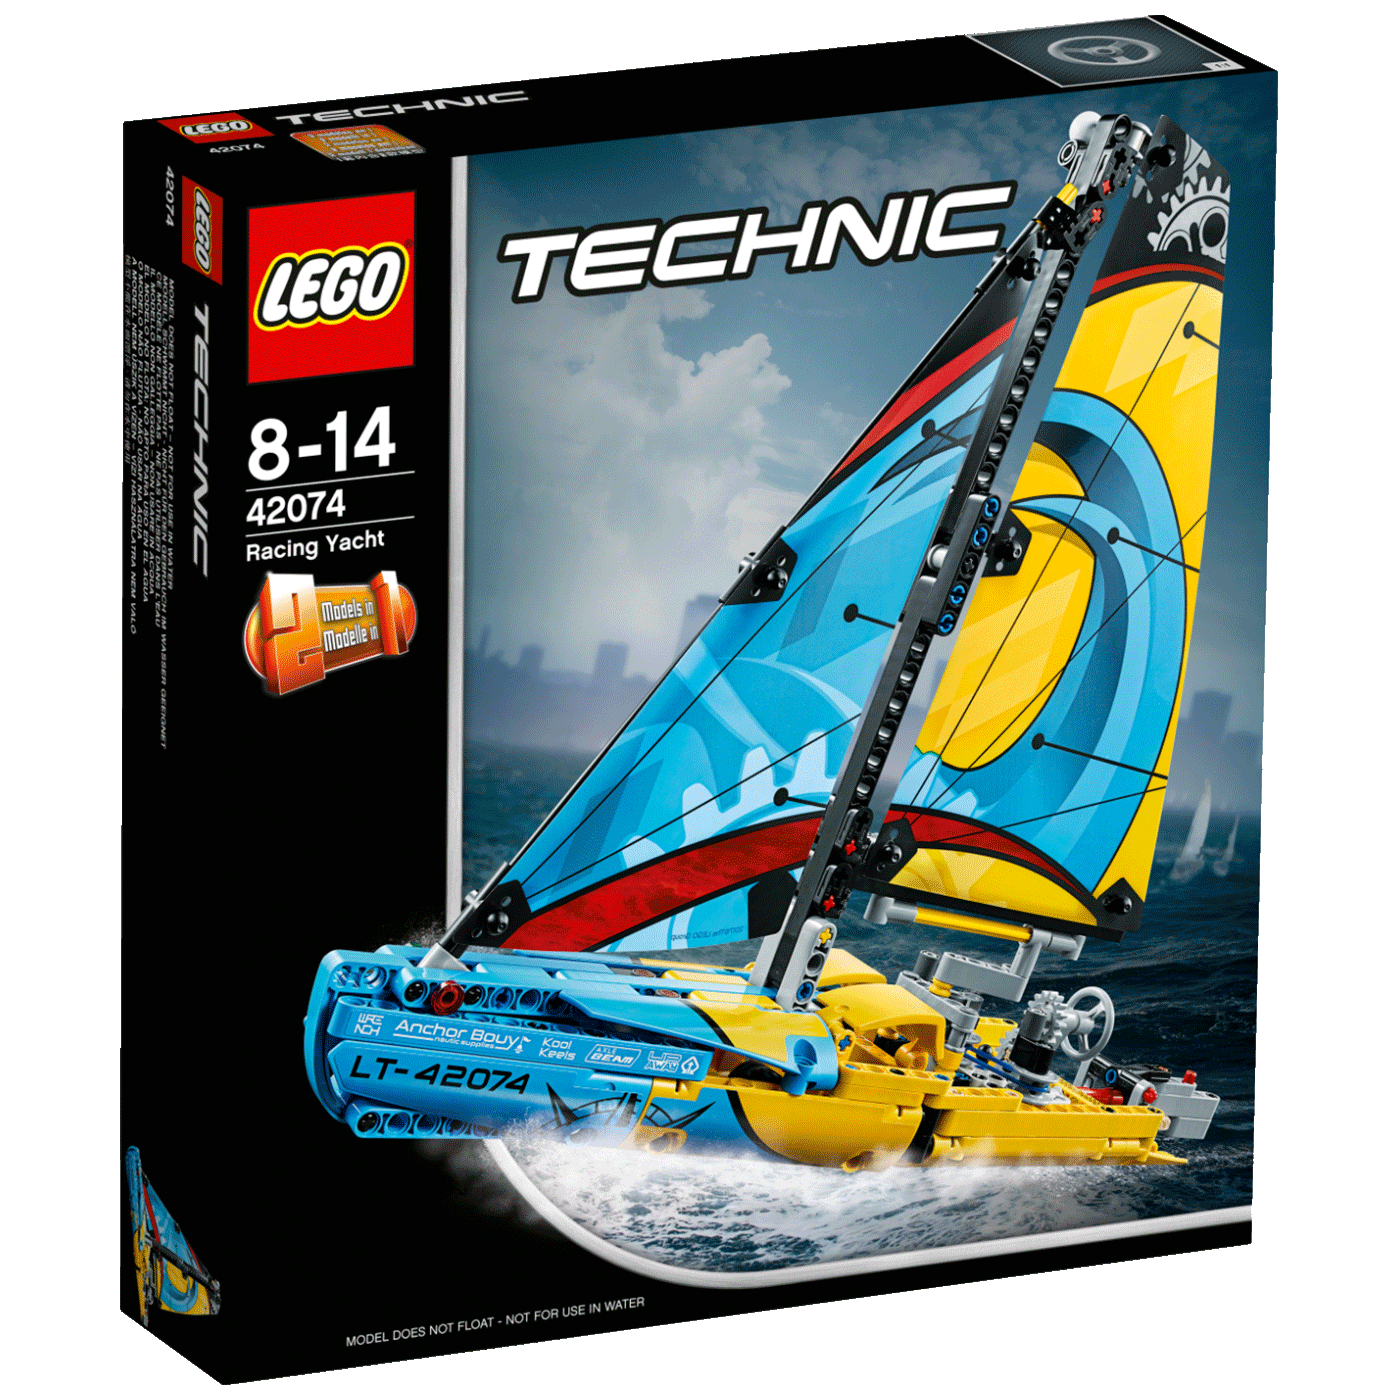 Trkaća jahta, LEGO Technic